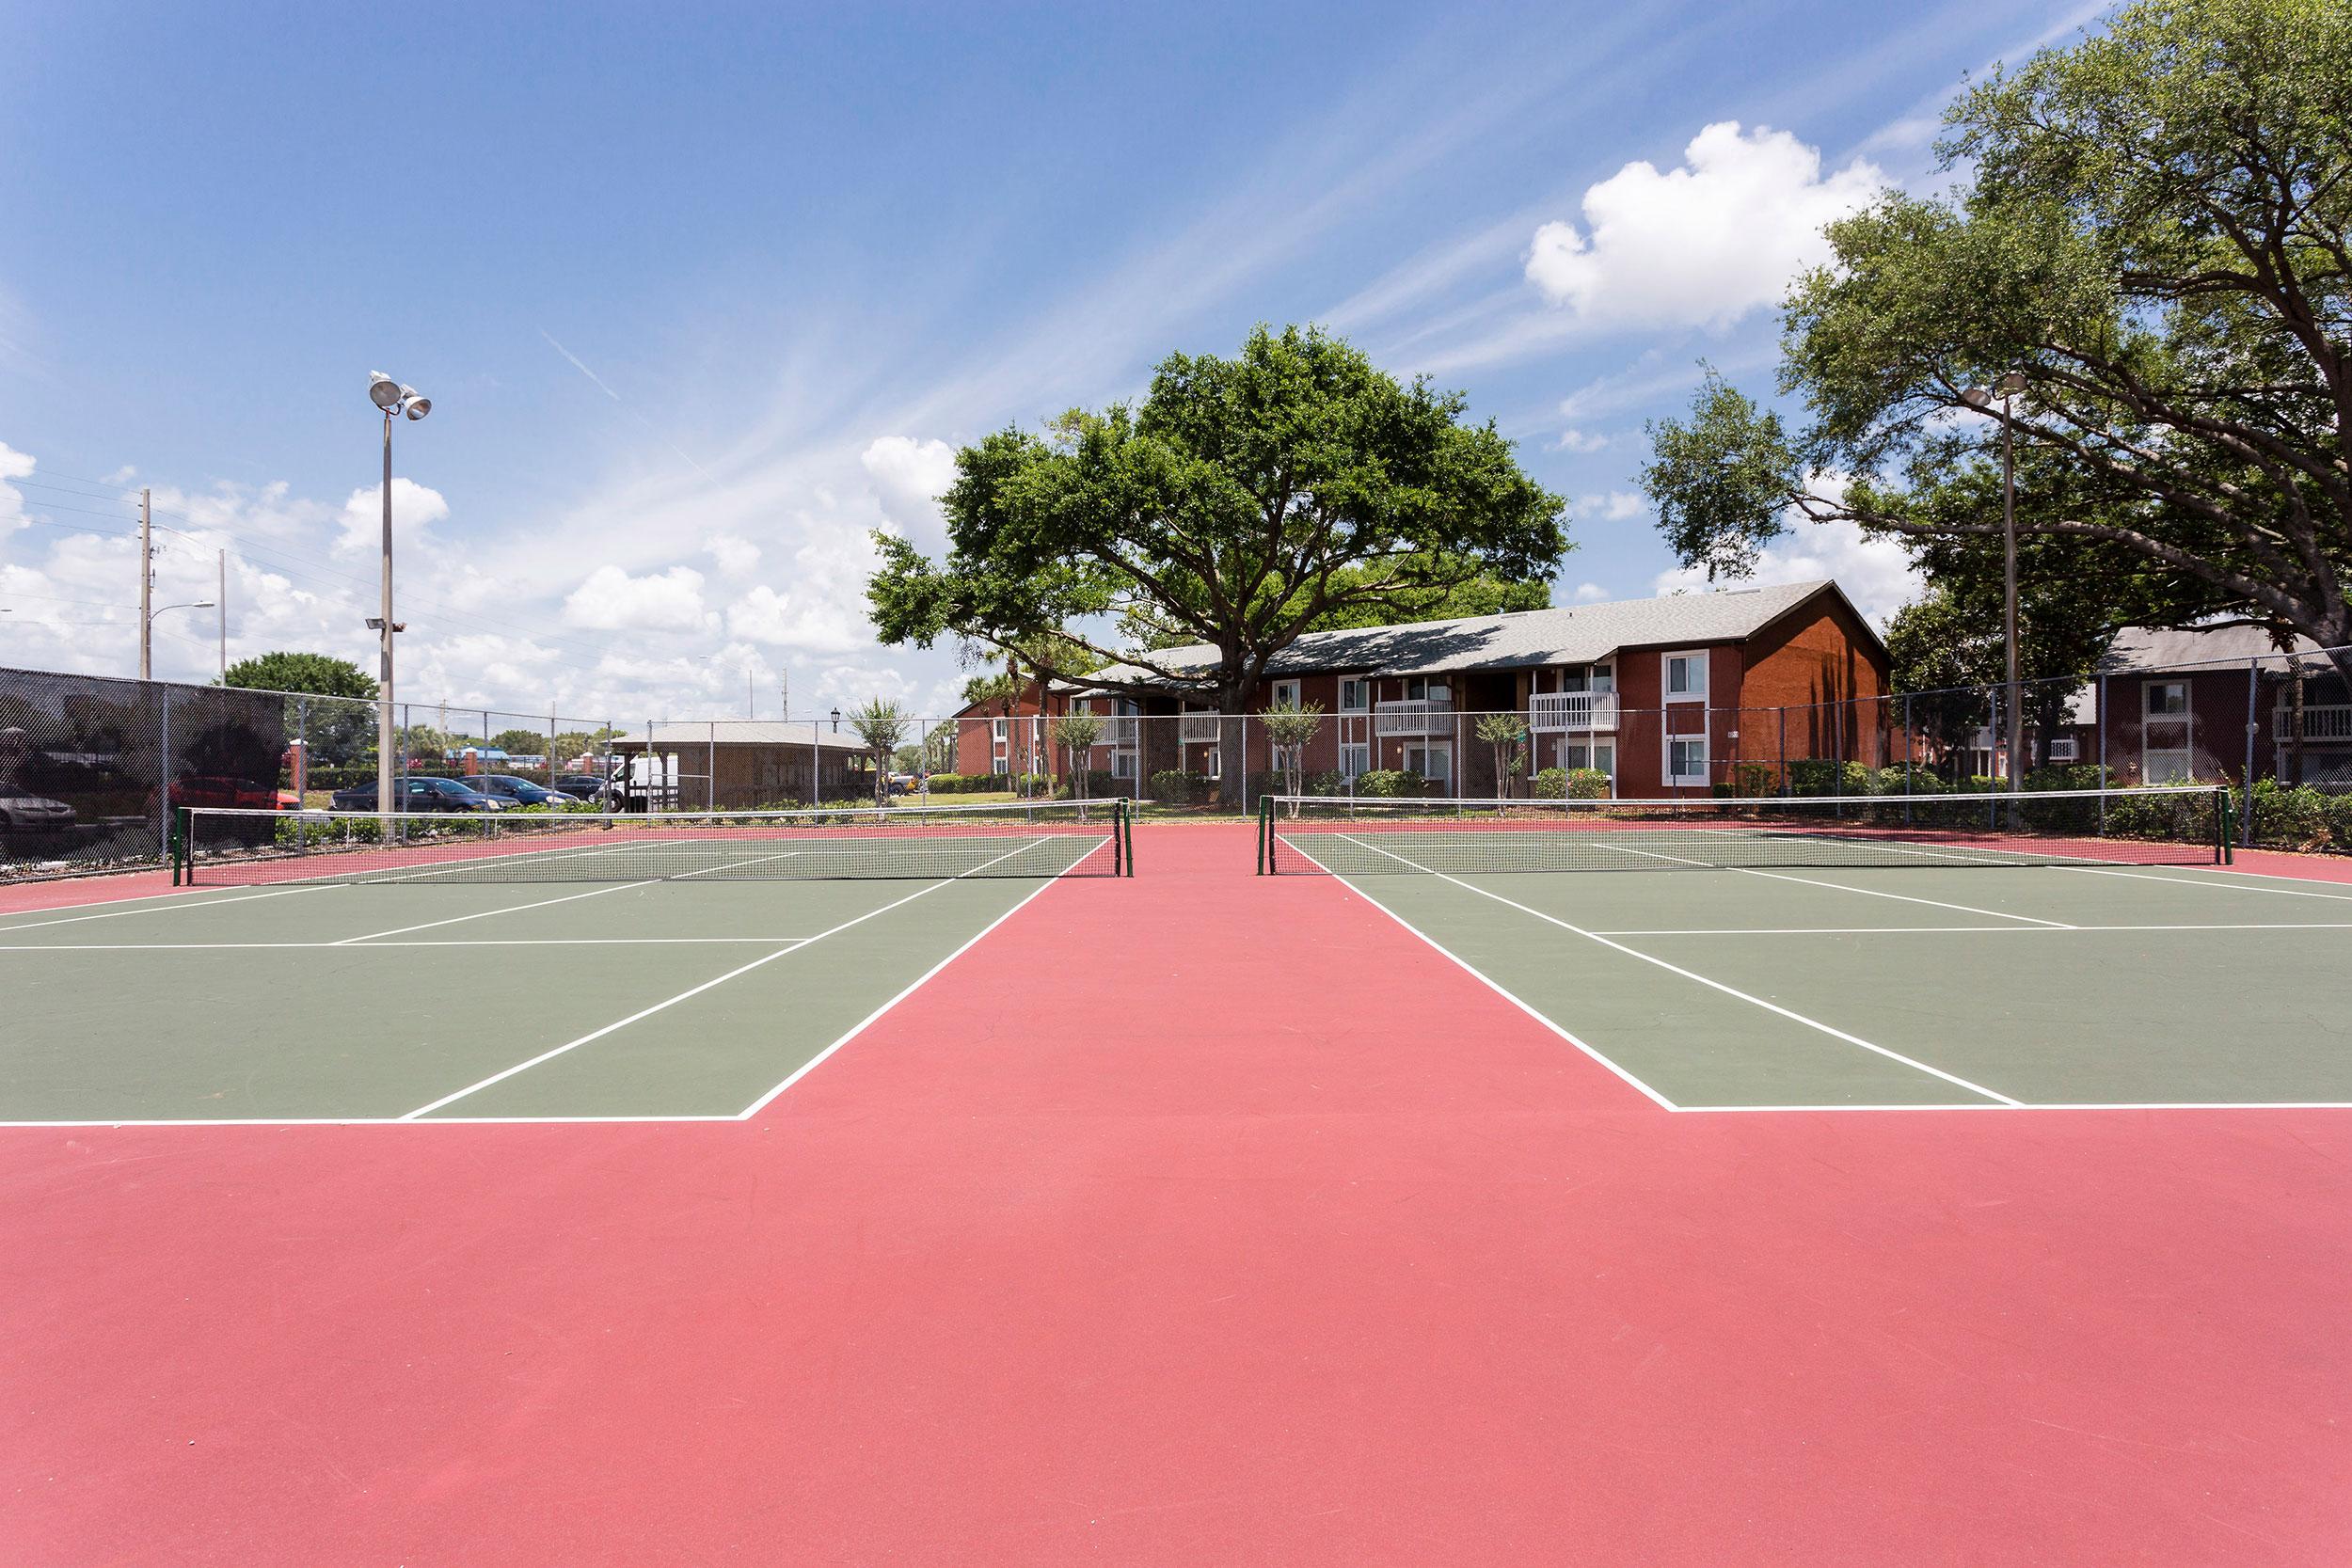 Hb-amen-tennis